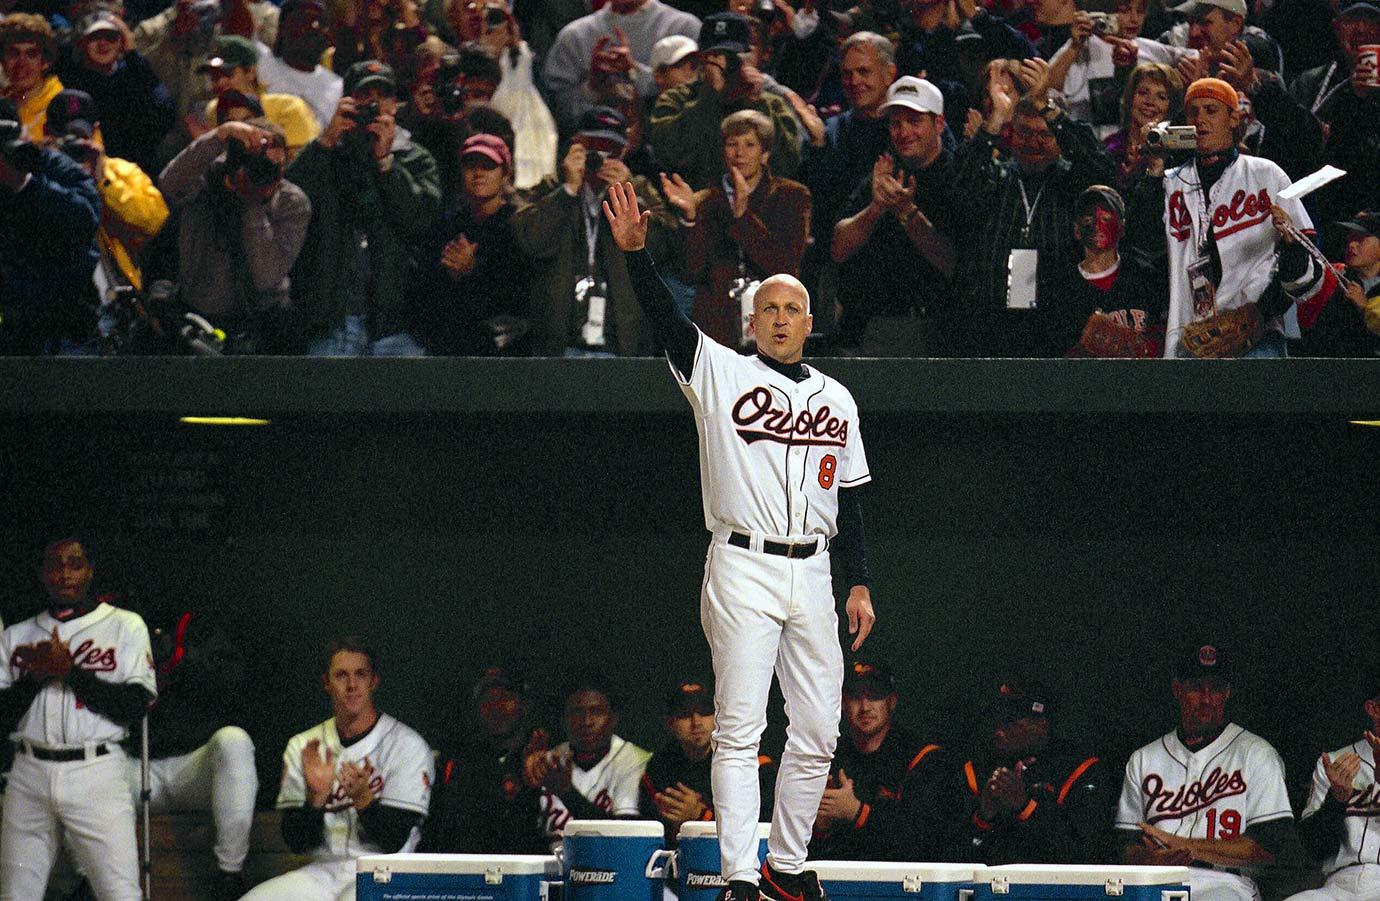 Oct. 6, 2001 (final game)